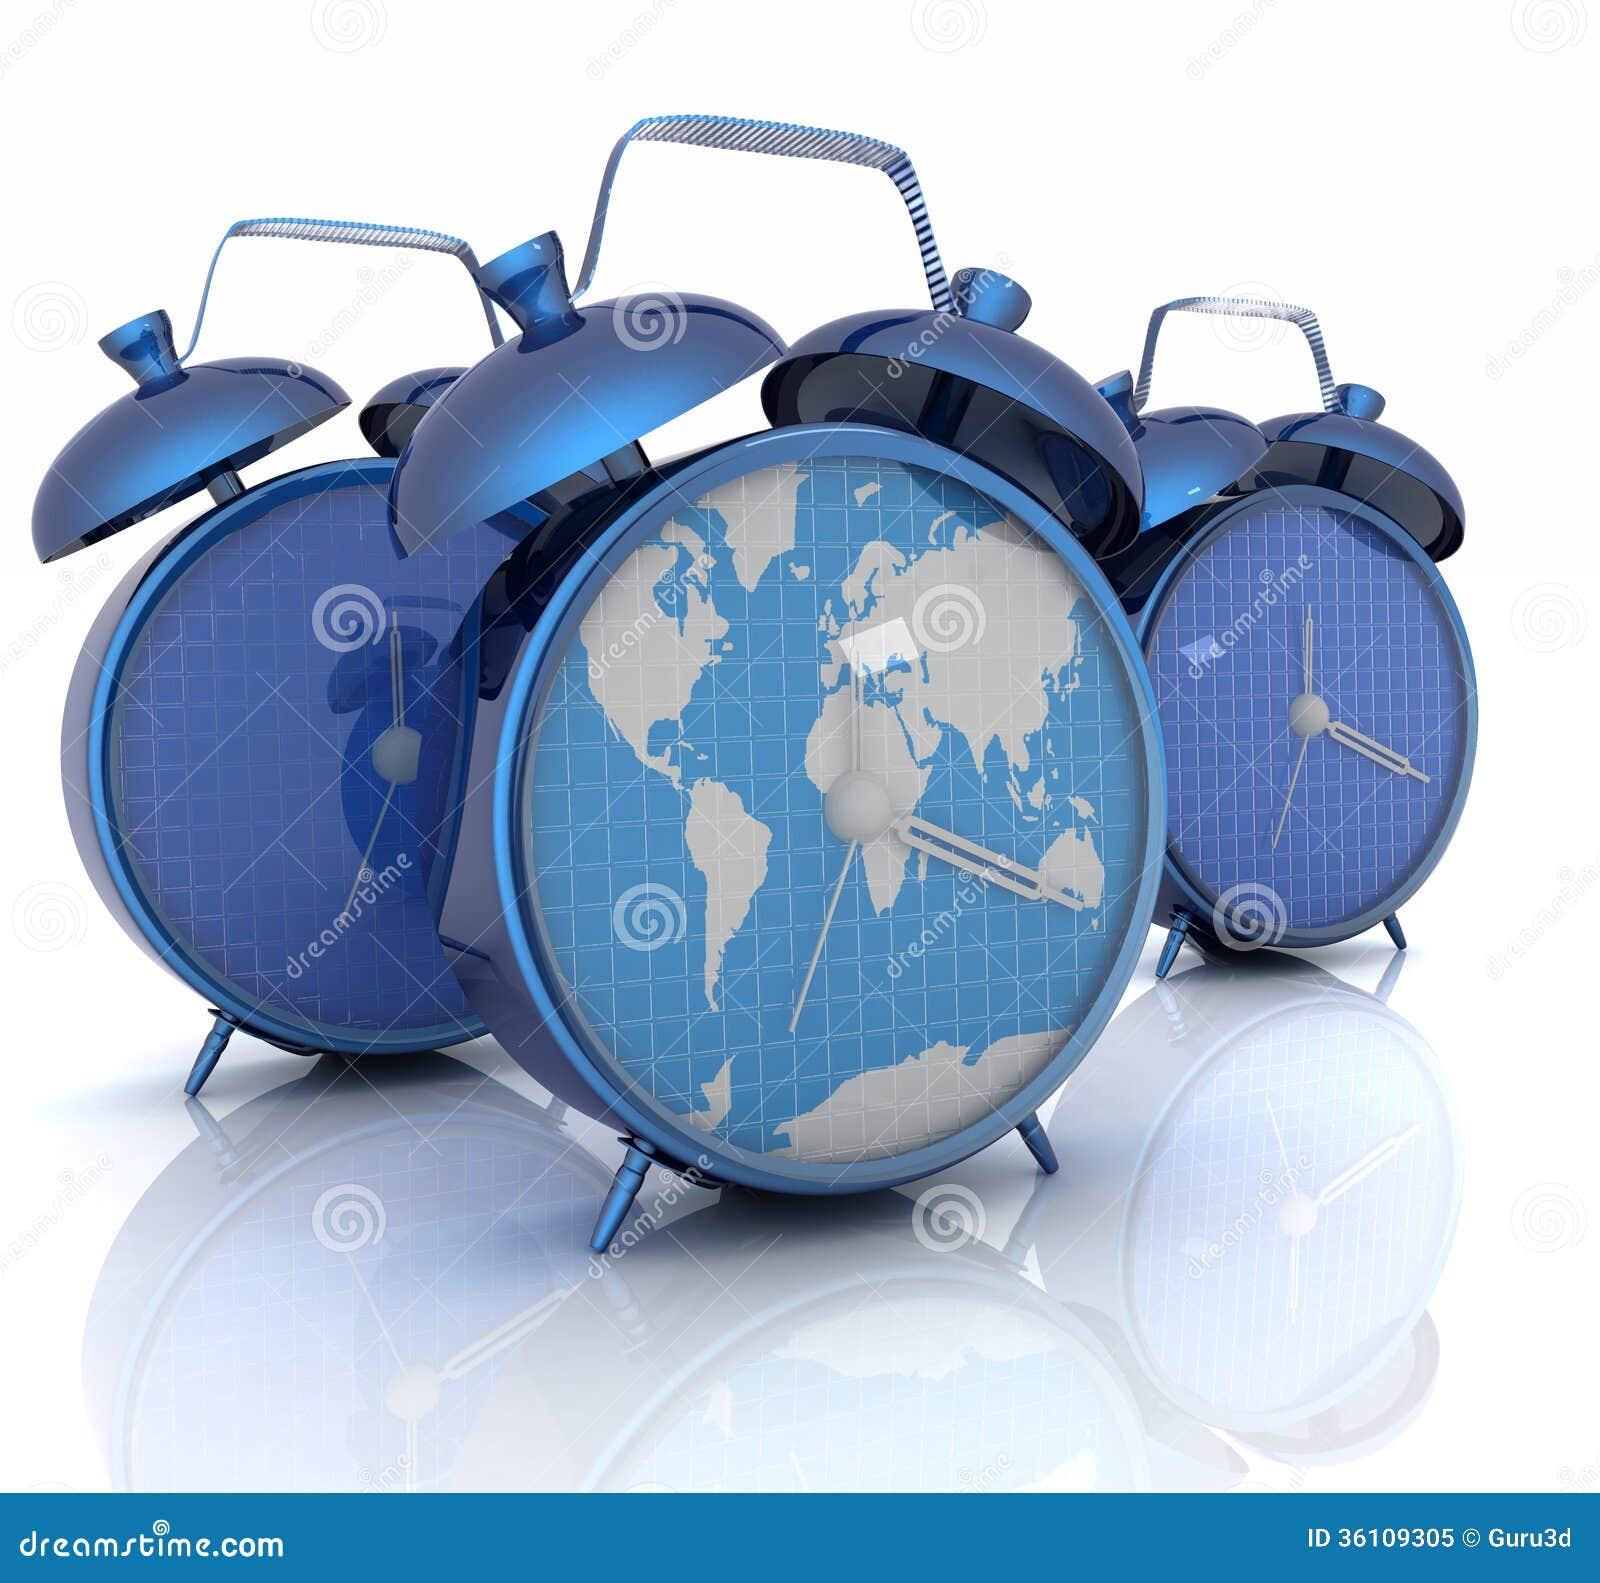 Alarm clock of world map and alarm clocks stock illustration alarm clock of world map and alarm clocks gumiabroncs Choice Image